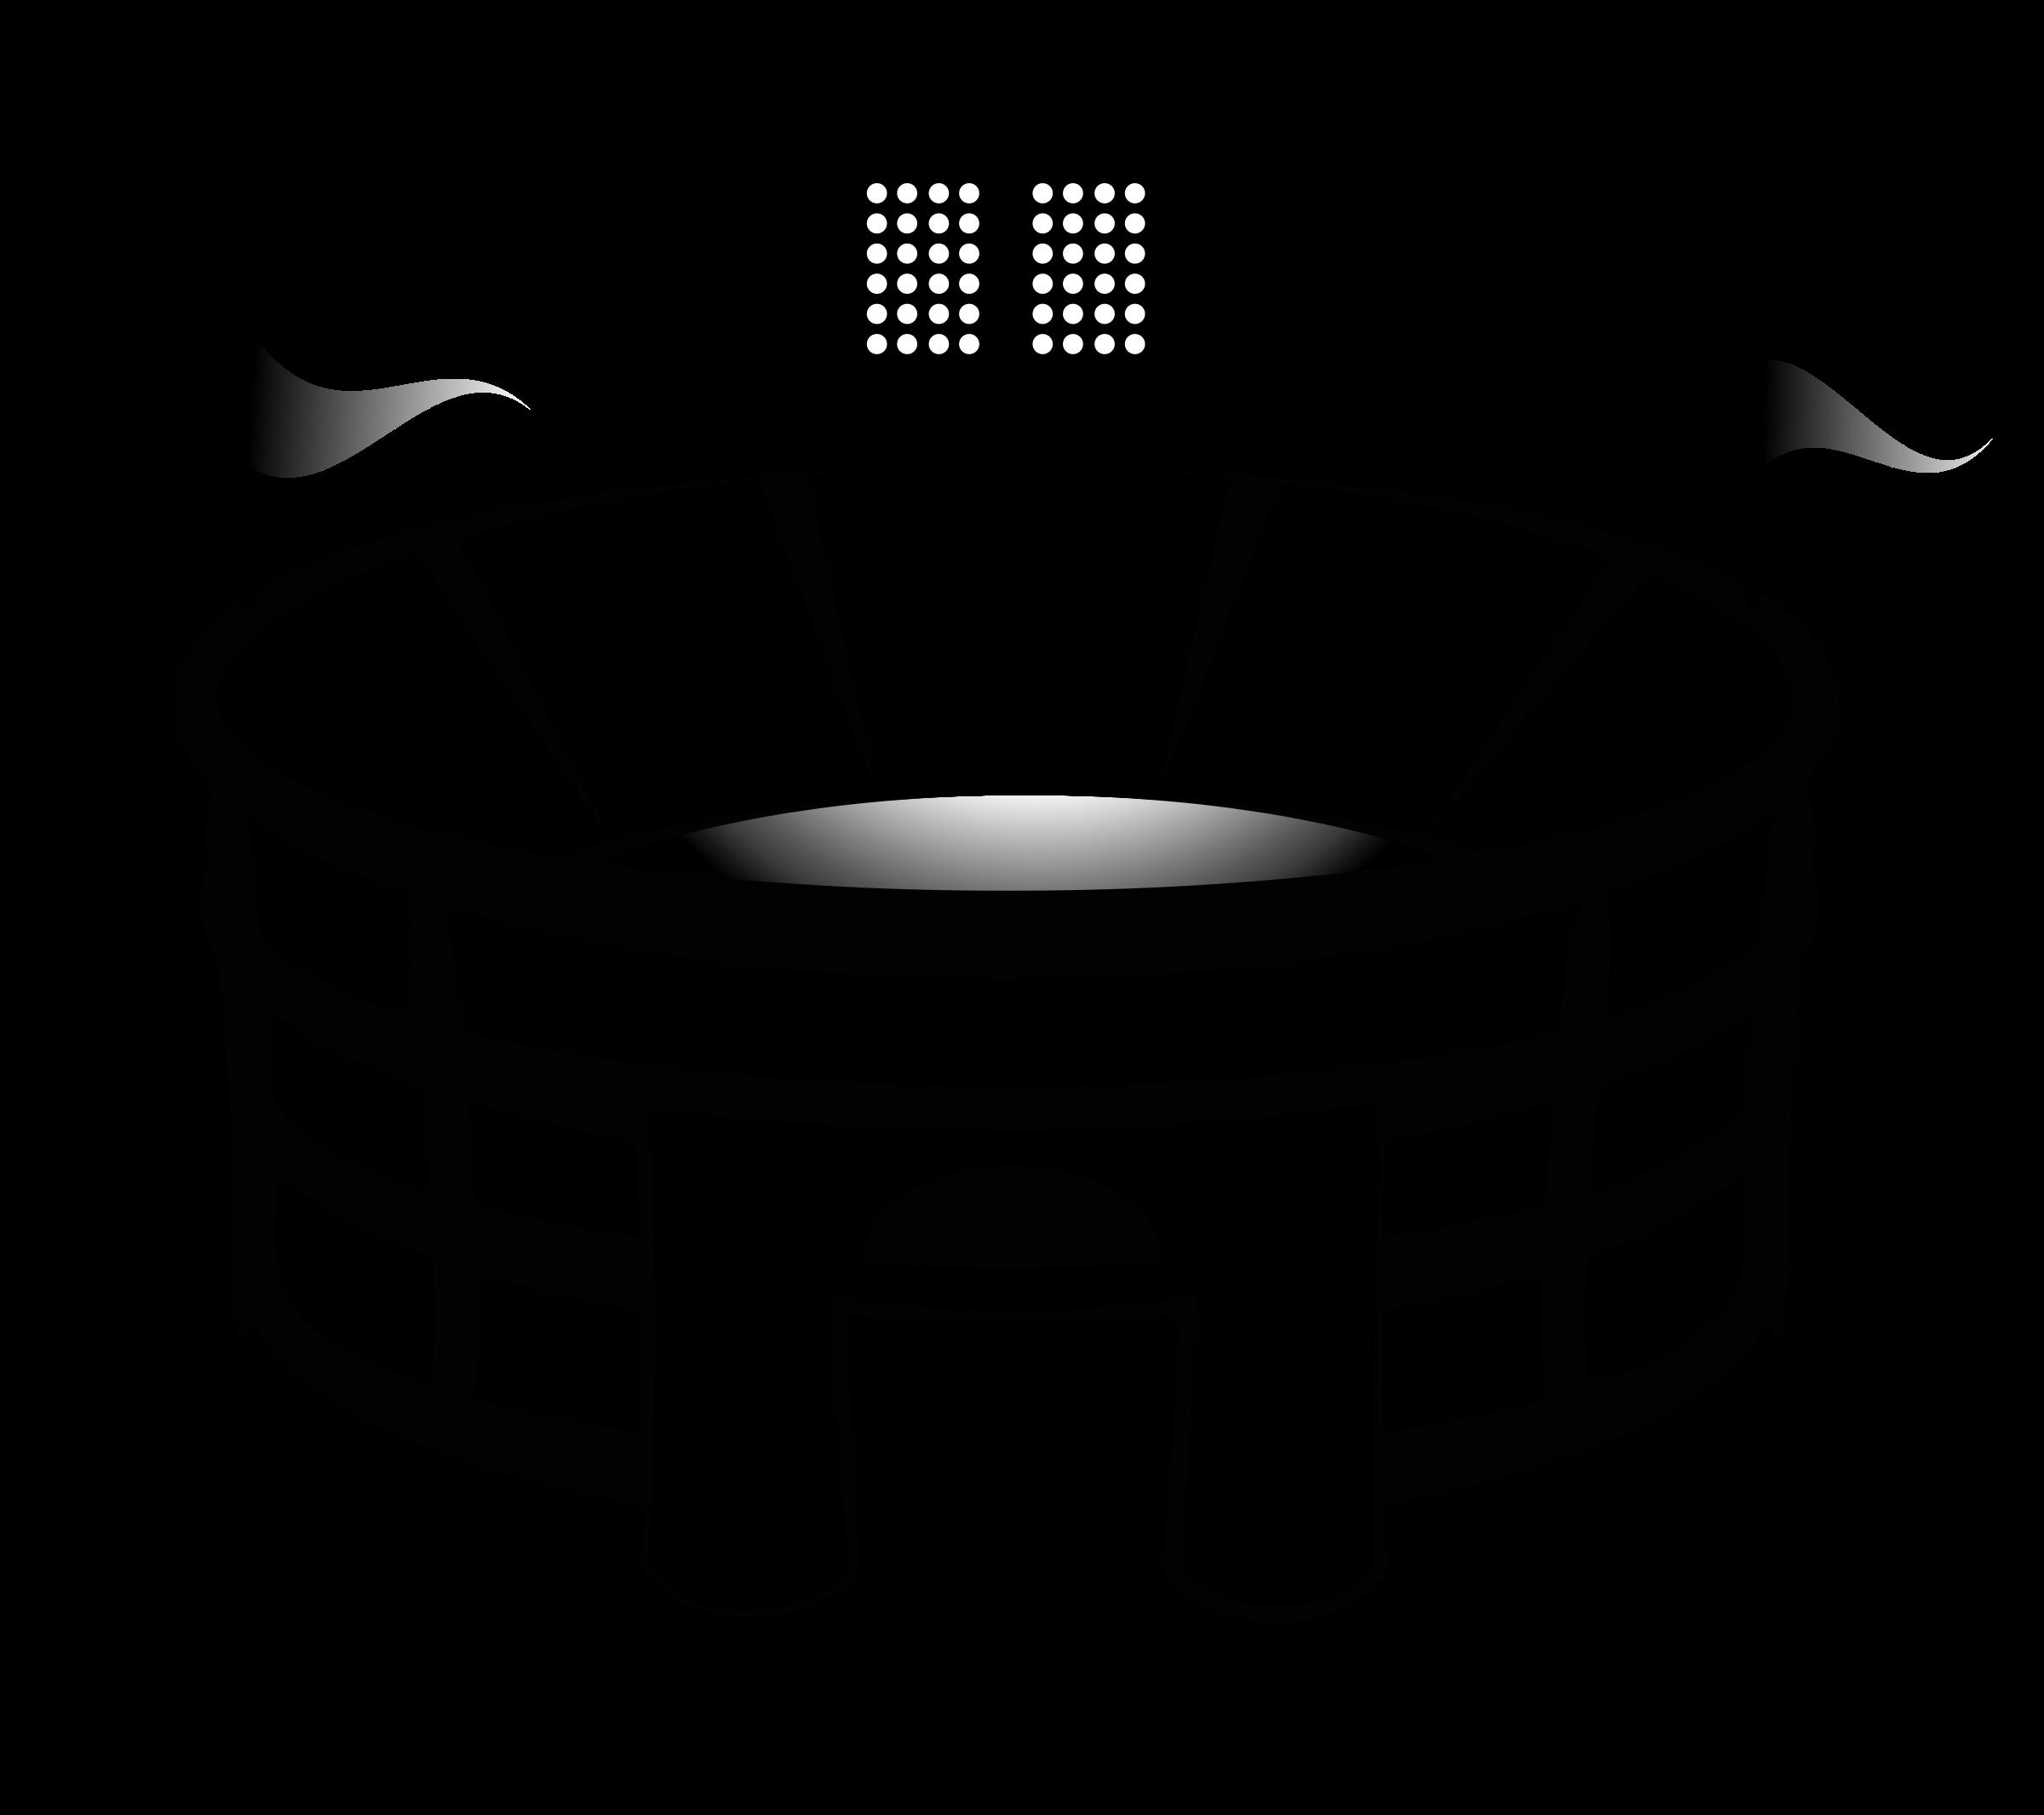 Stadium clipart black and white Stadium Clipart Clipart Images Clipart